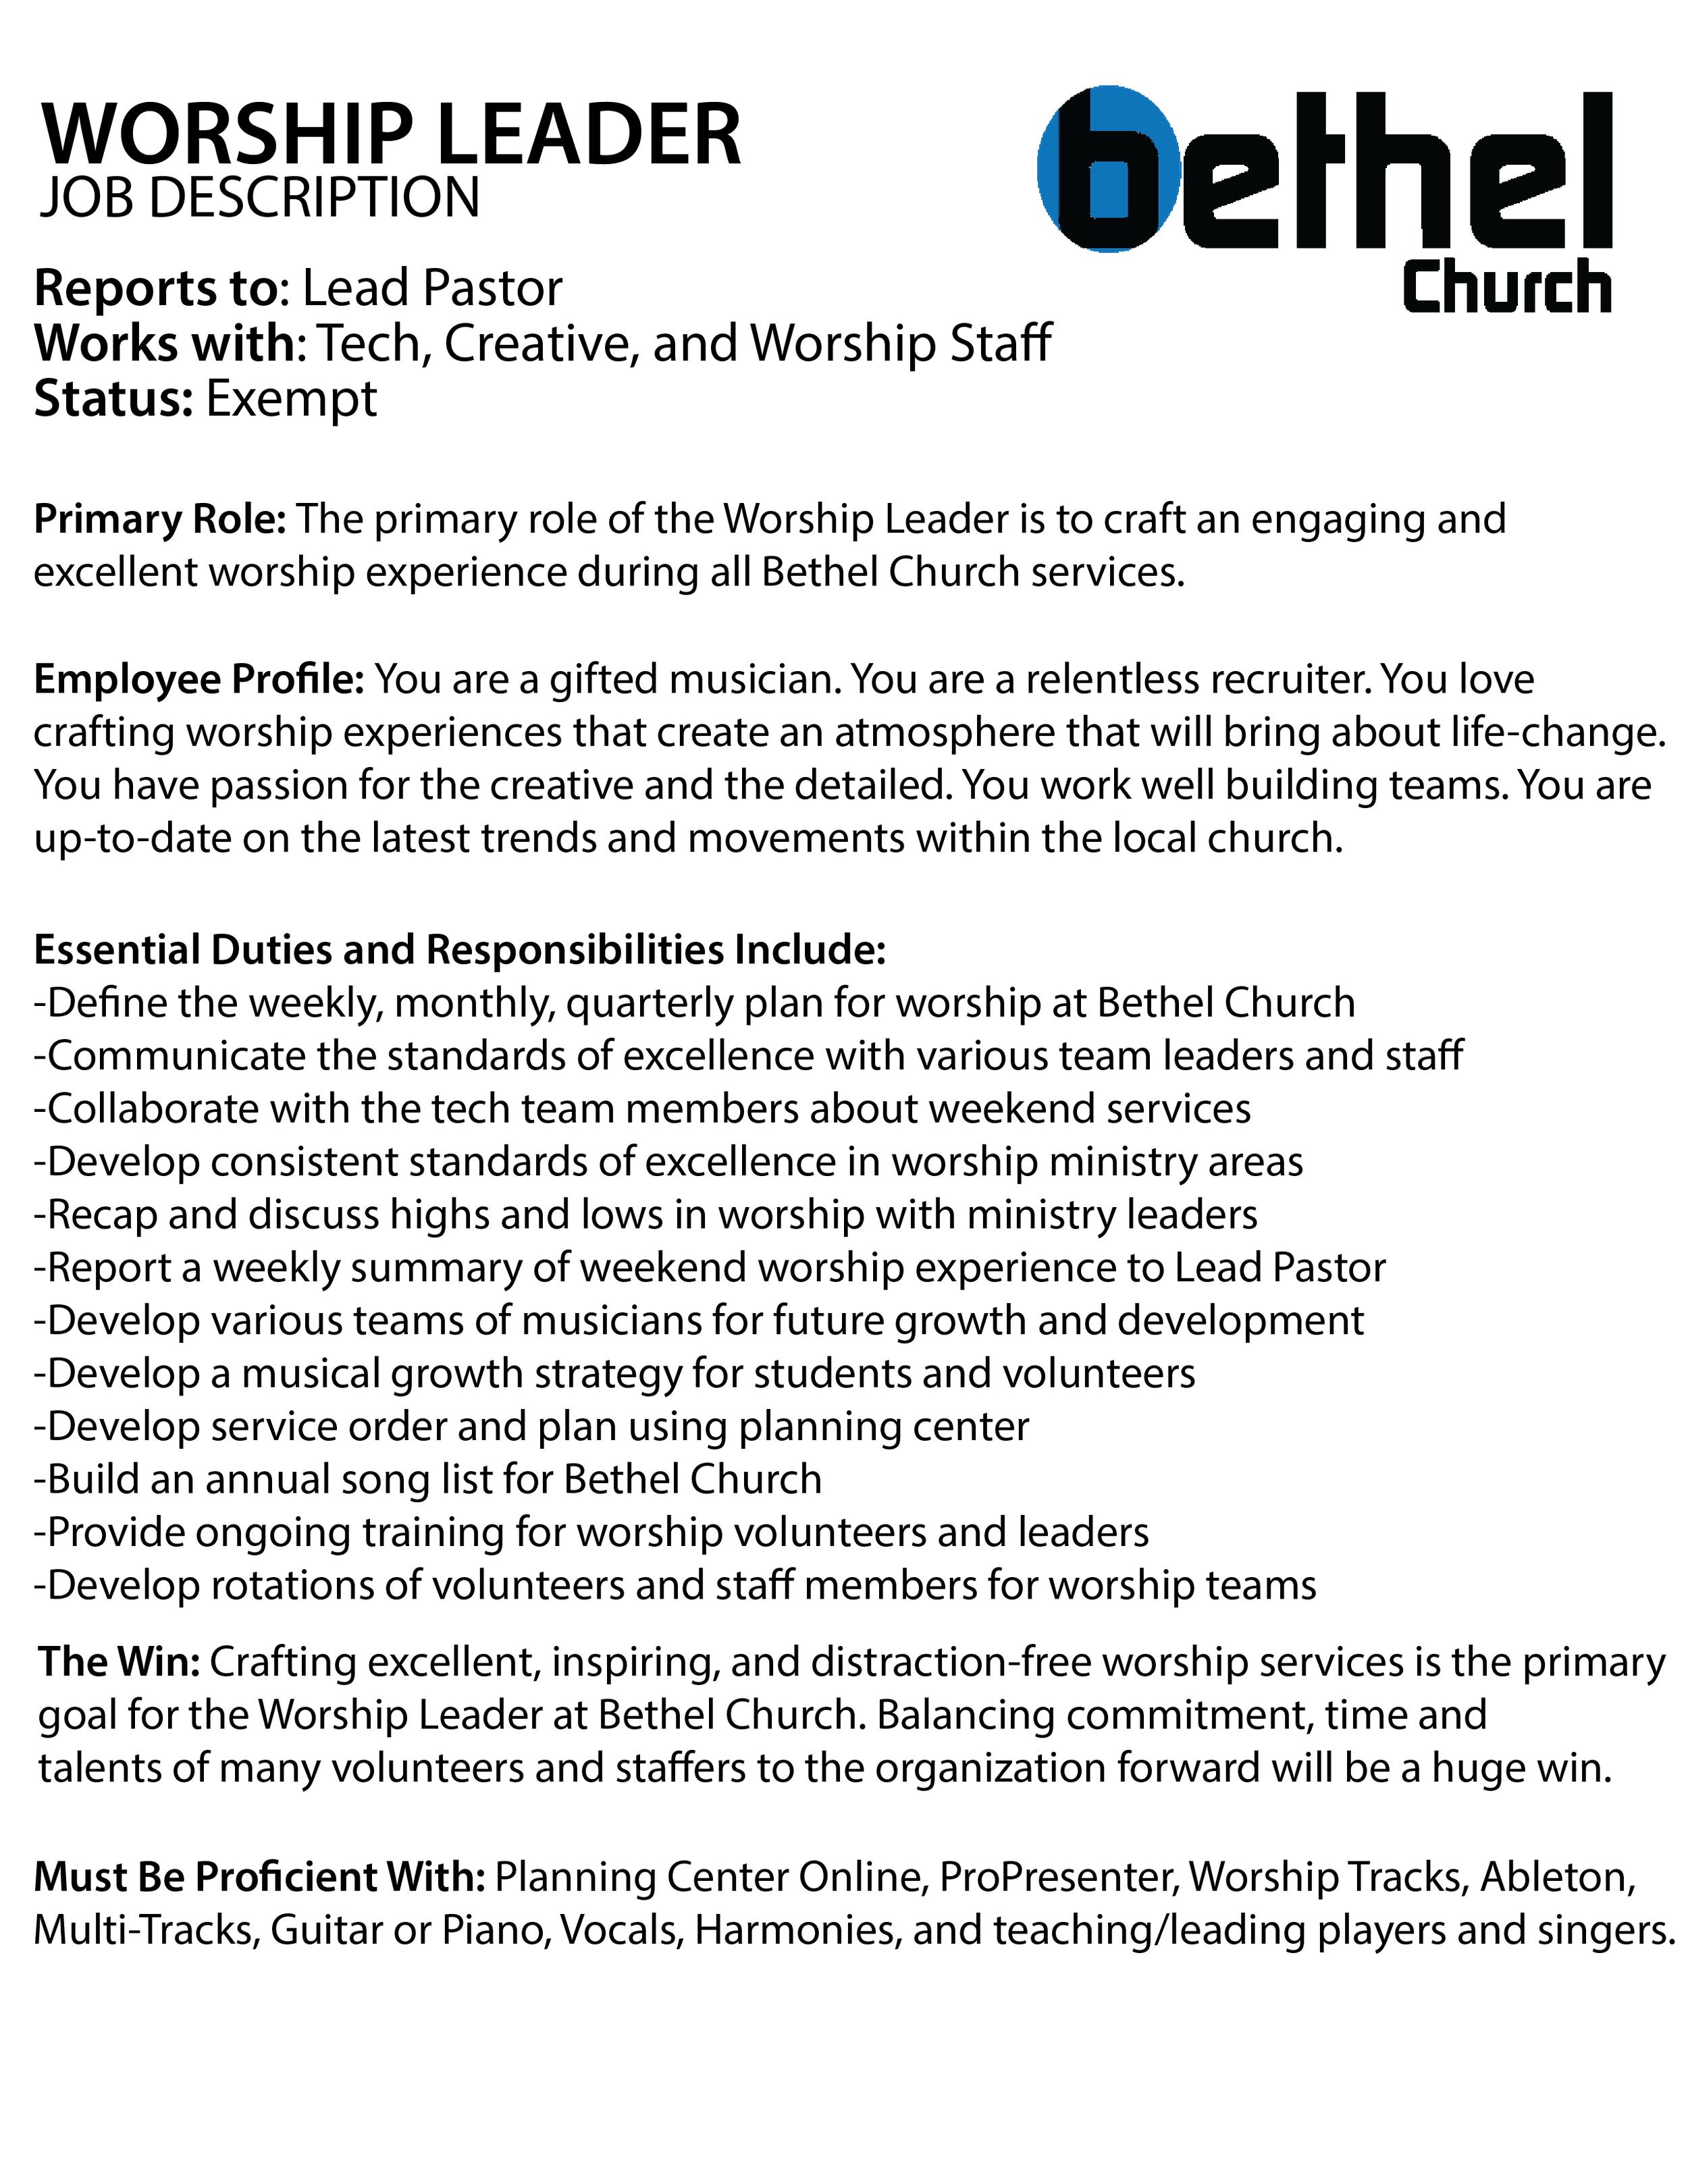 Bethel Church Worship Leader Job Description